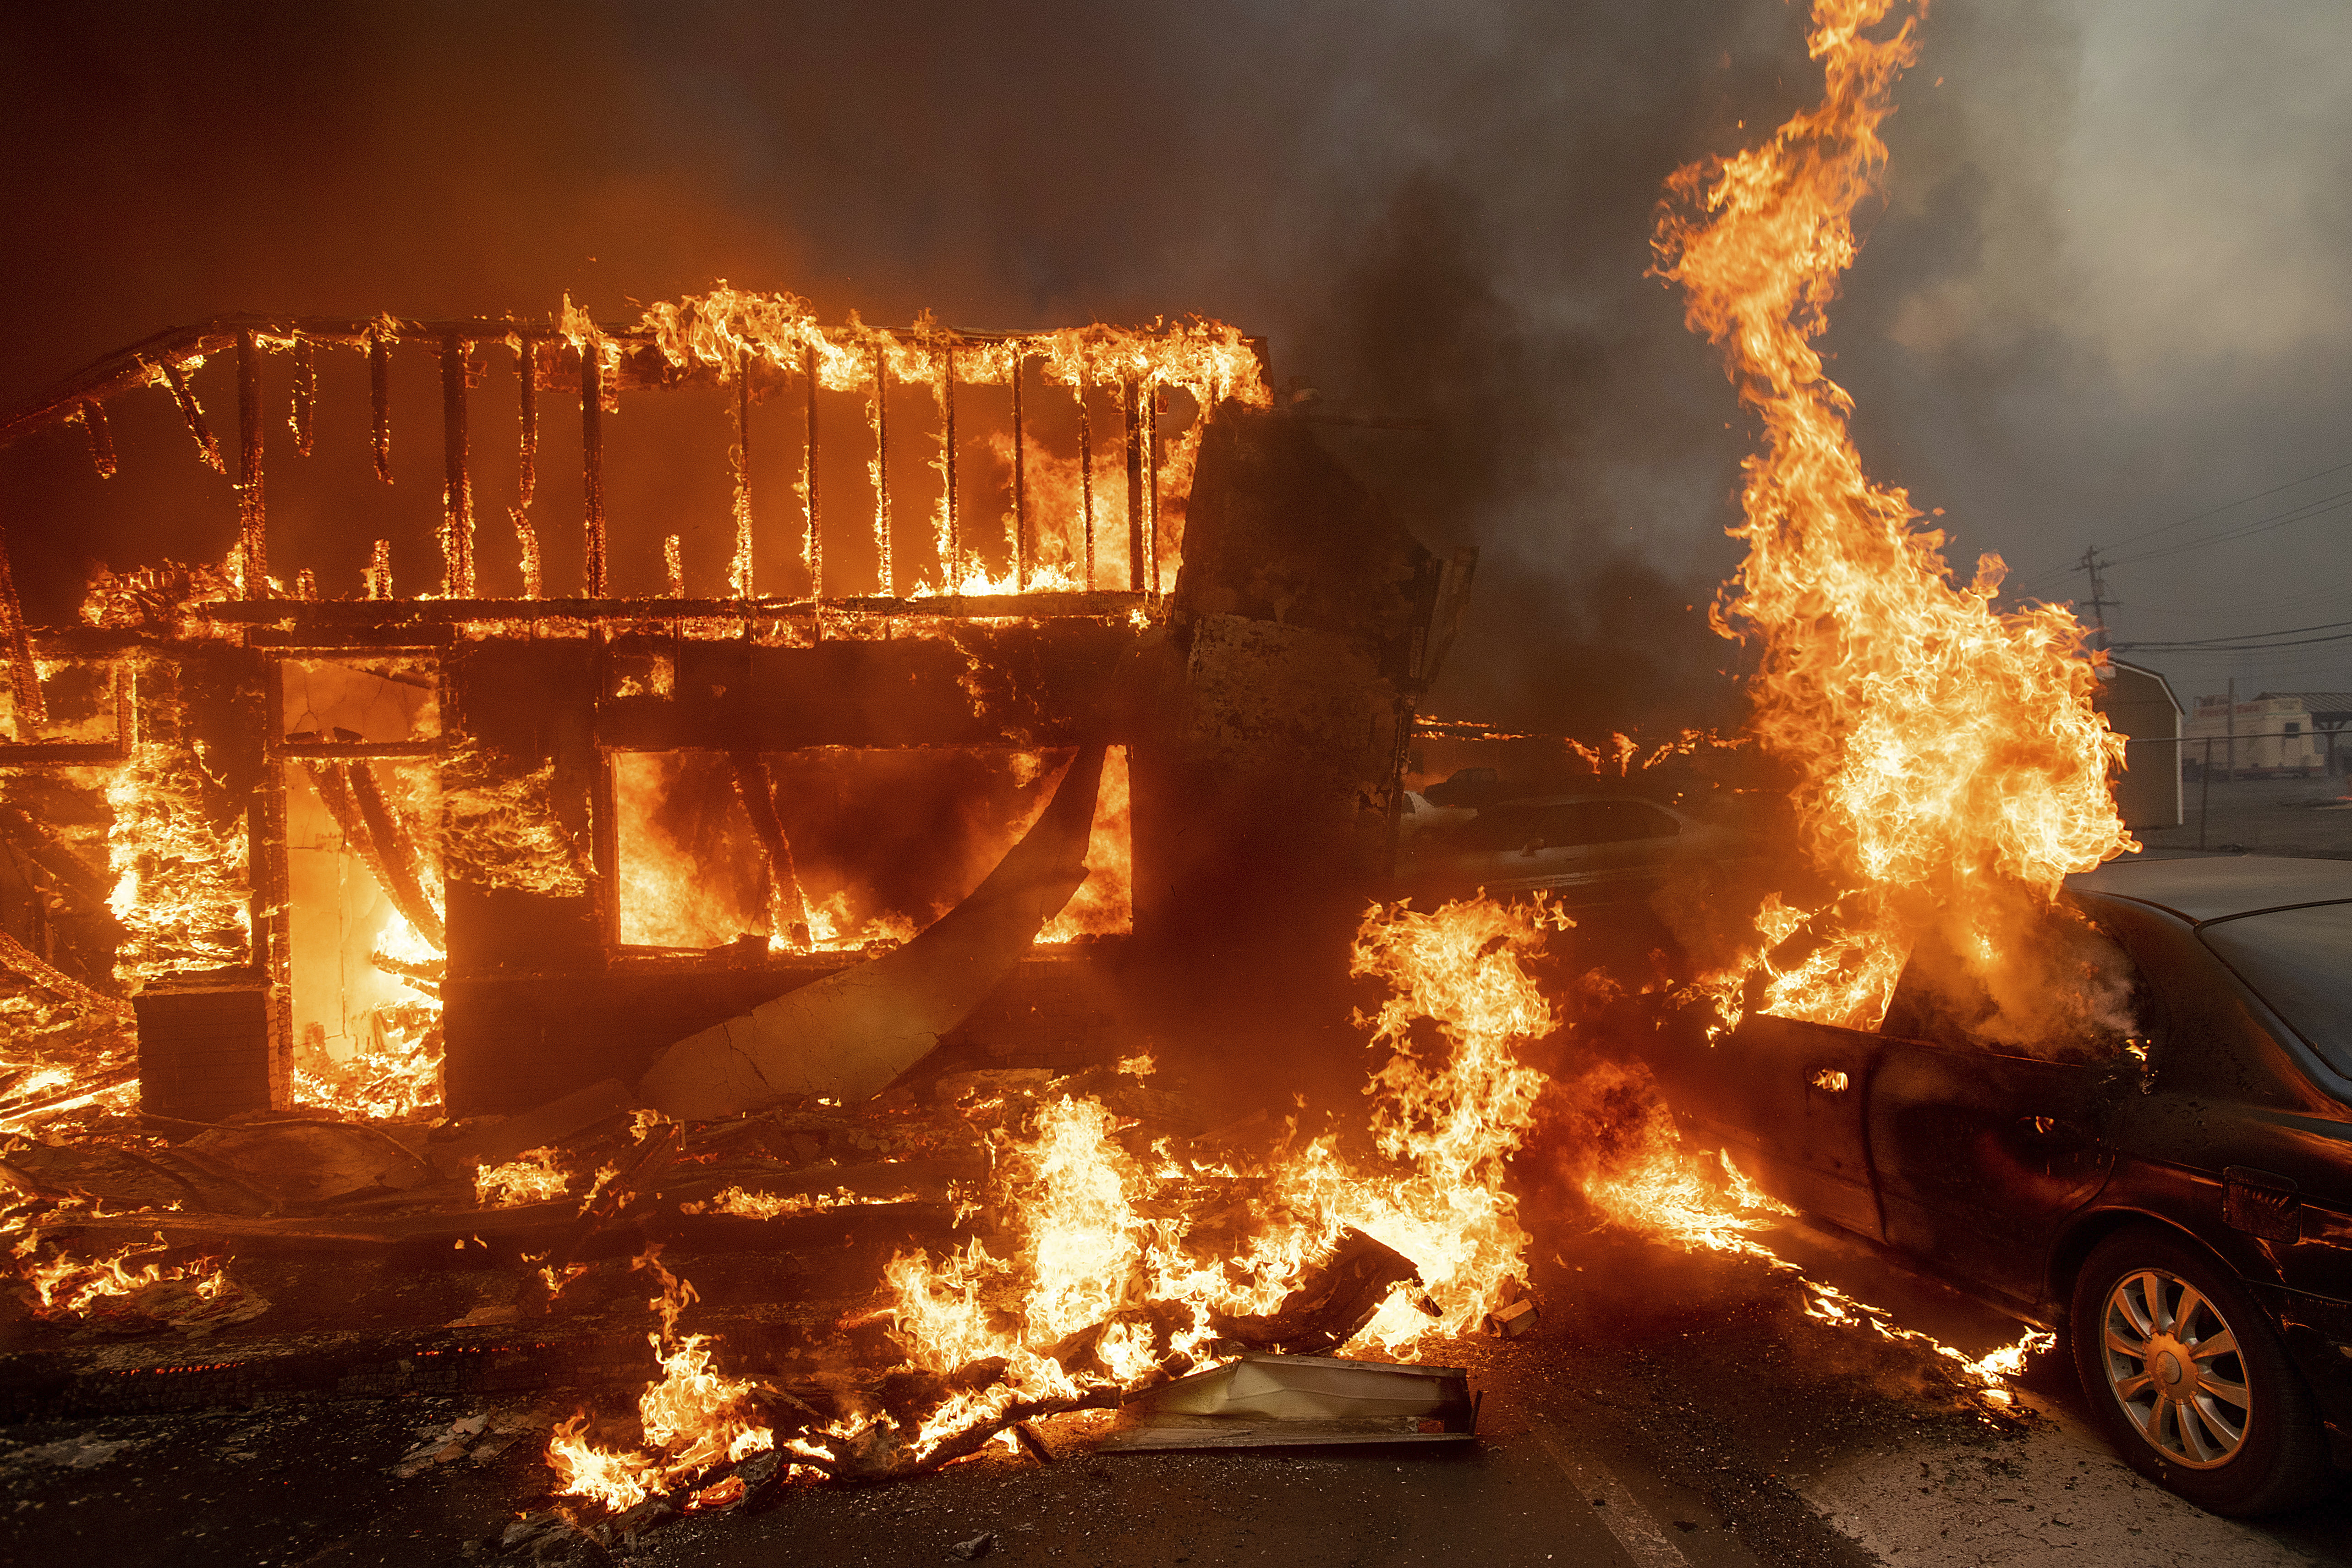 Flames consume a car and building as Camp Fire tears through Paradise, Calif., on Thursday, Nov. 8, 2018.